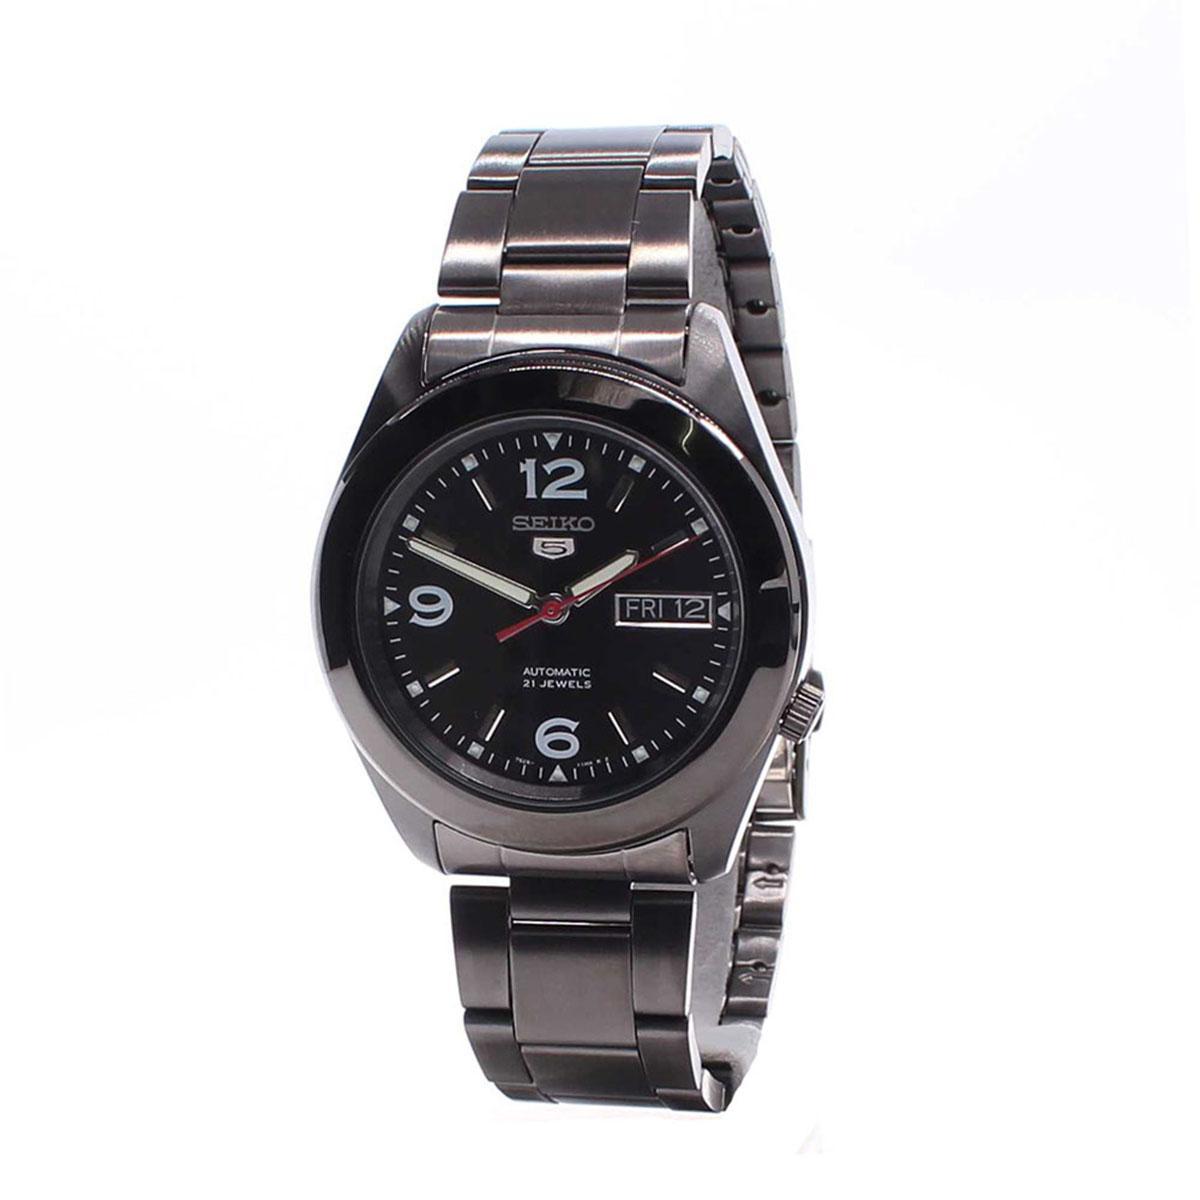 Rp 1.401.900. Seiko Seiko 5 Automatic Black Stainless-Steel Case Stainless-Steel Bracelet Mens NWT + Warranty ...